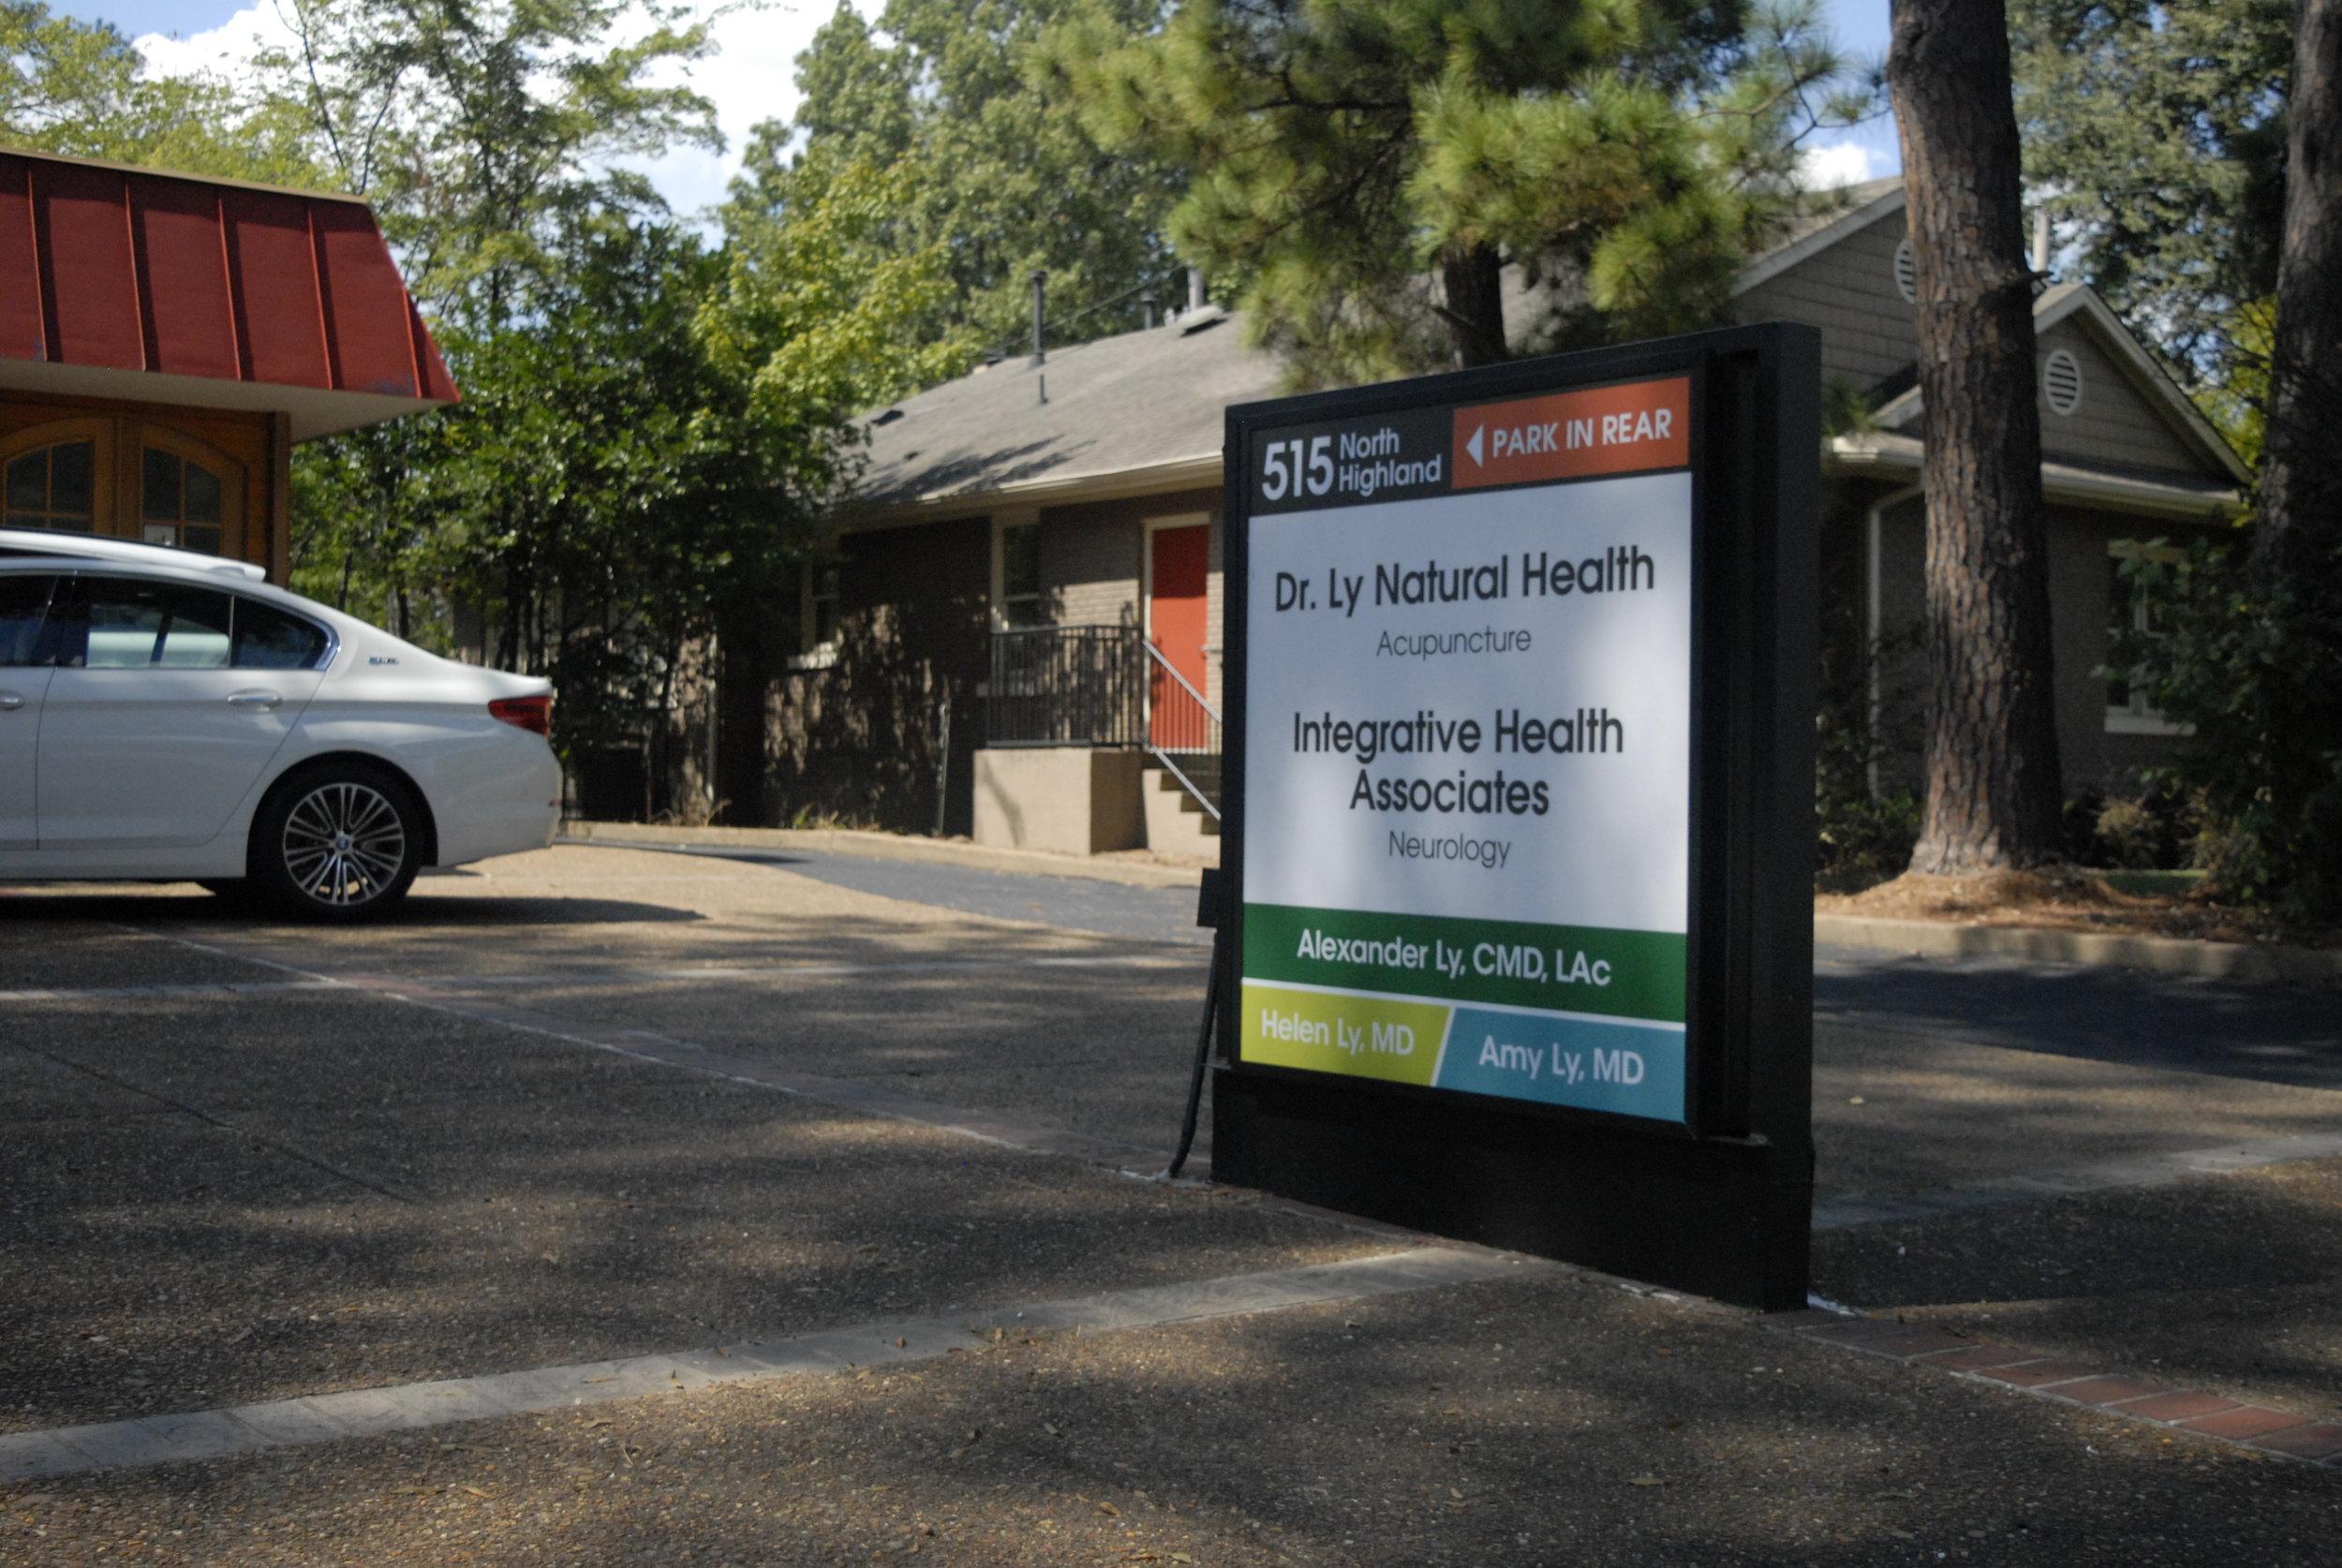 Integrative-Health-Associates_Signage_Branding_Dreamcapture_Memphis-TN